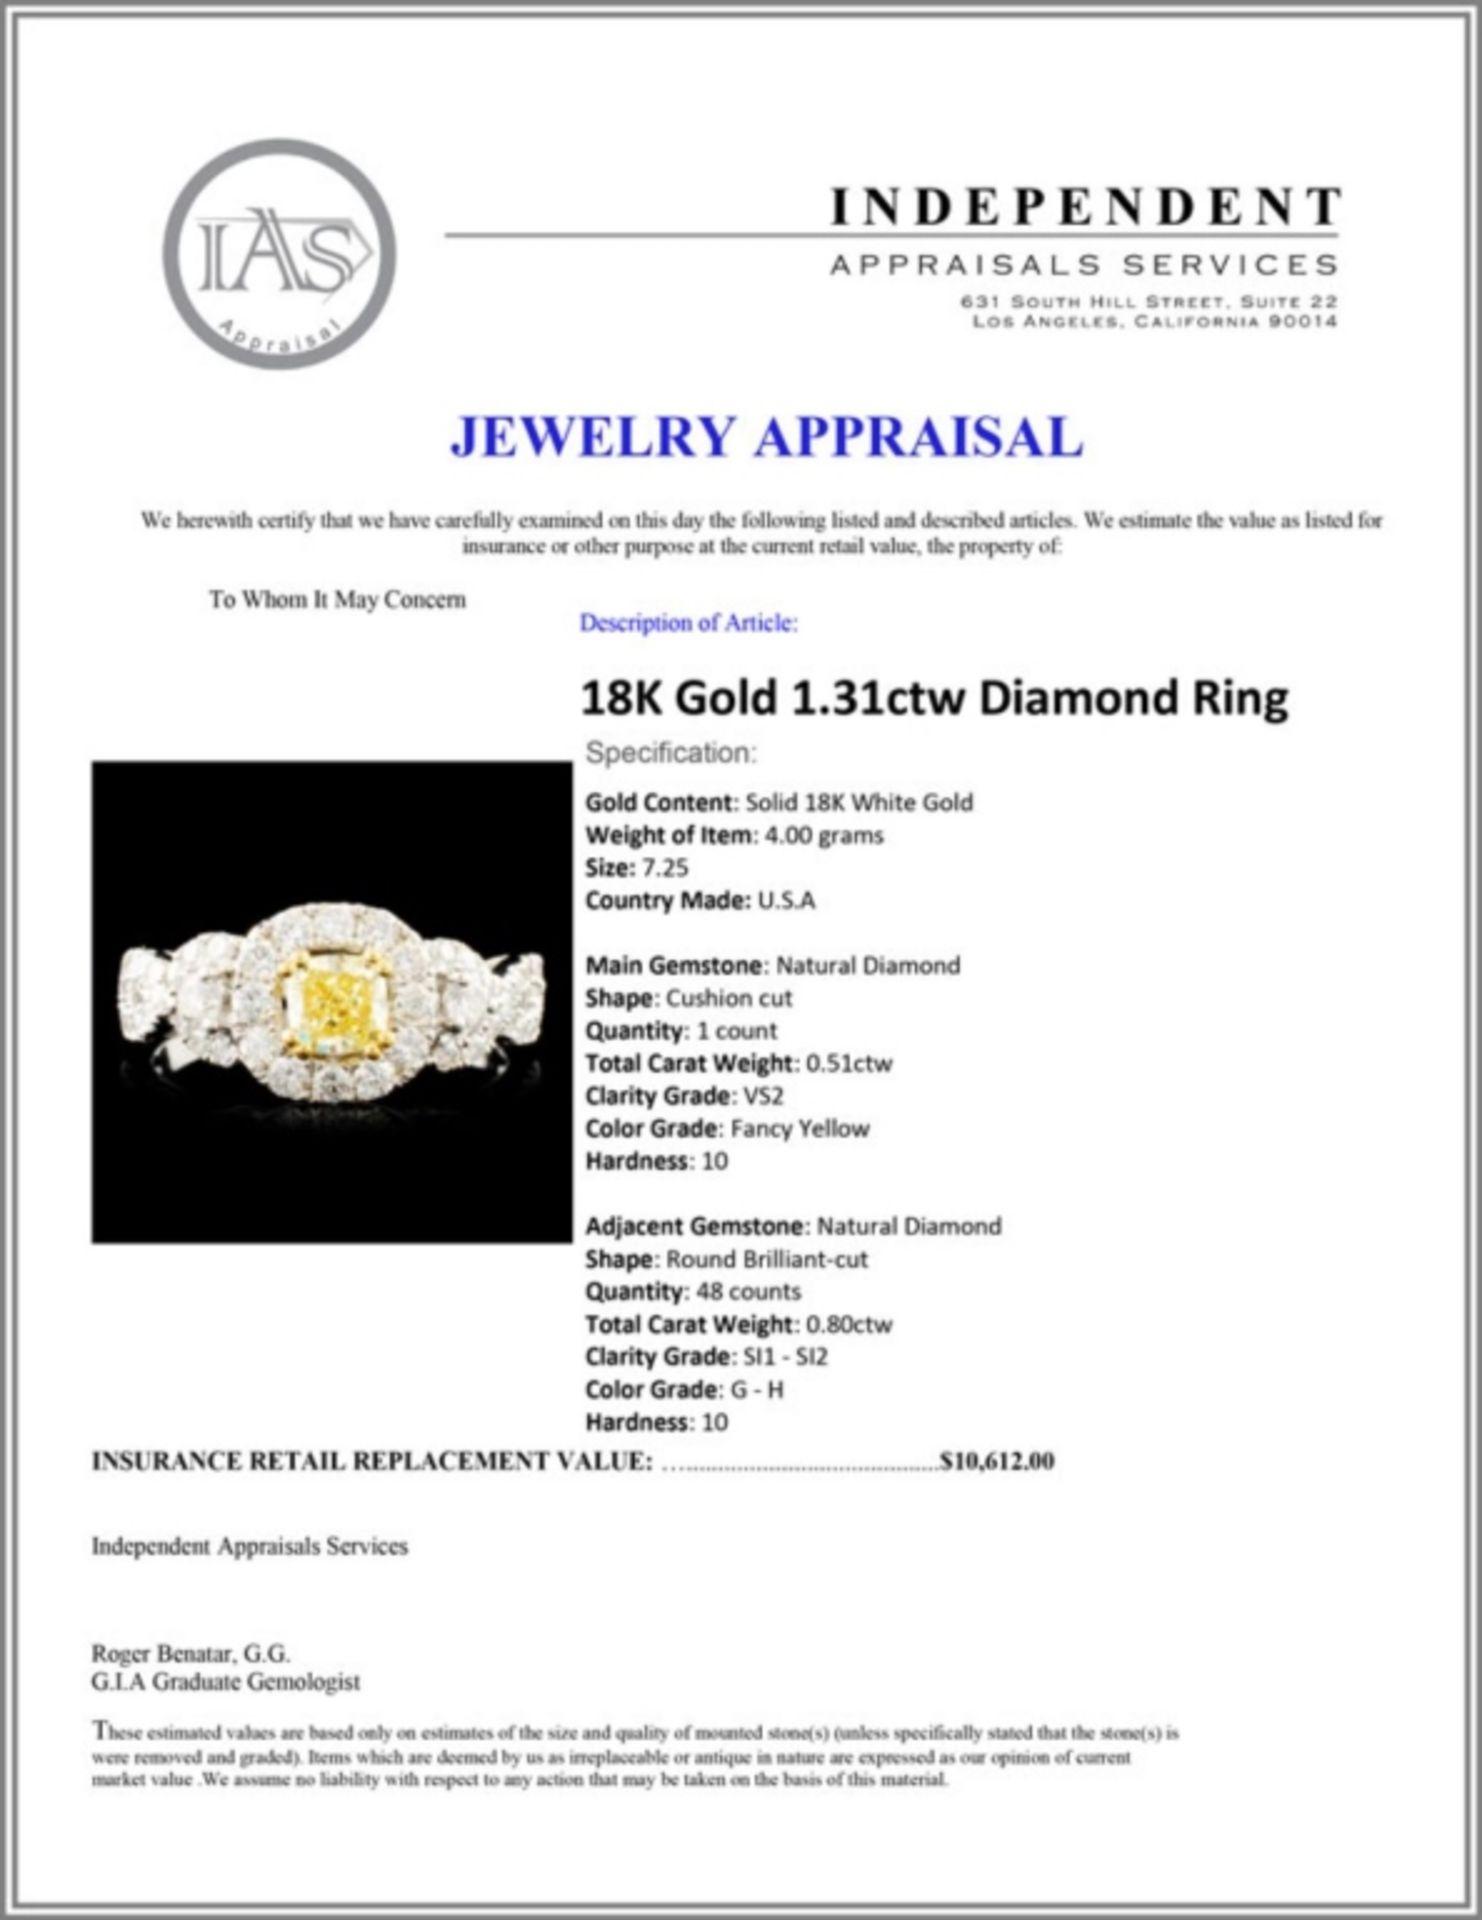 18K Gold 1.31ctw Diamond Ring - Image 5 of 5